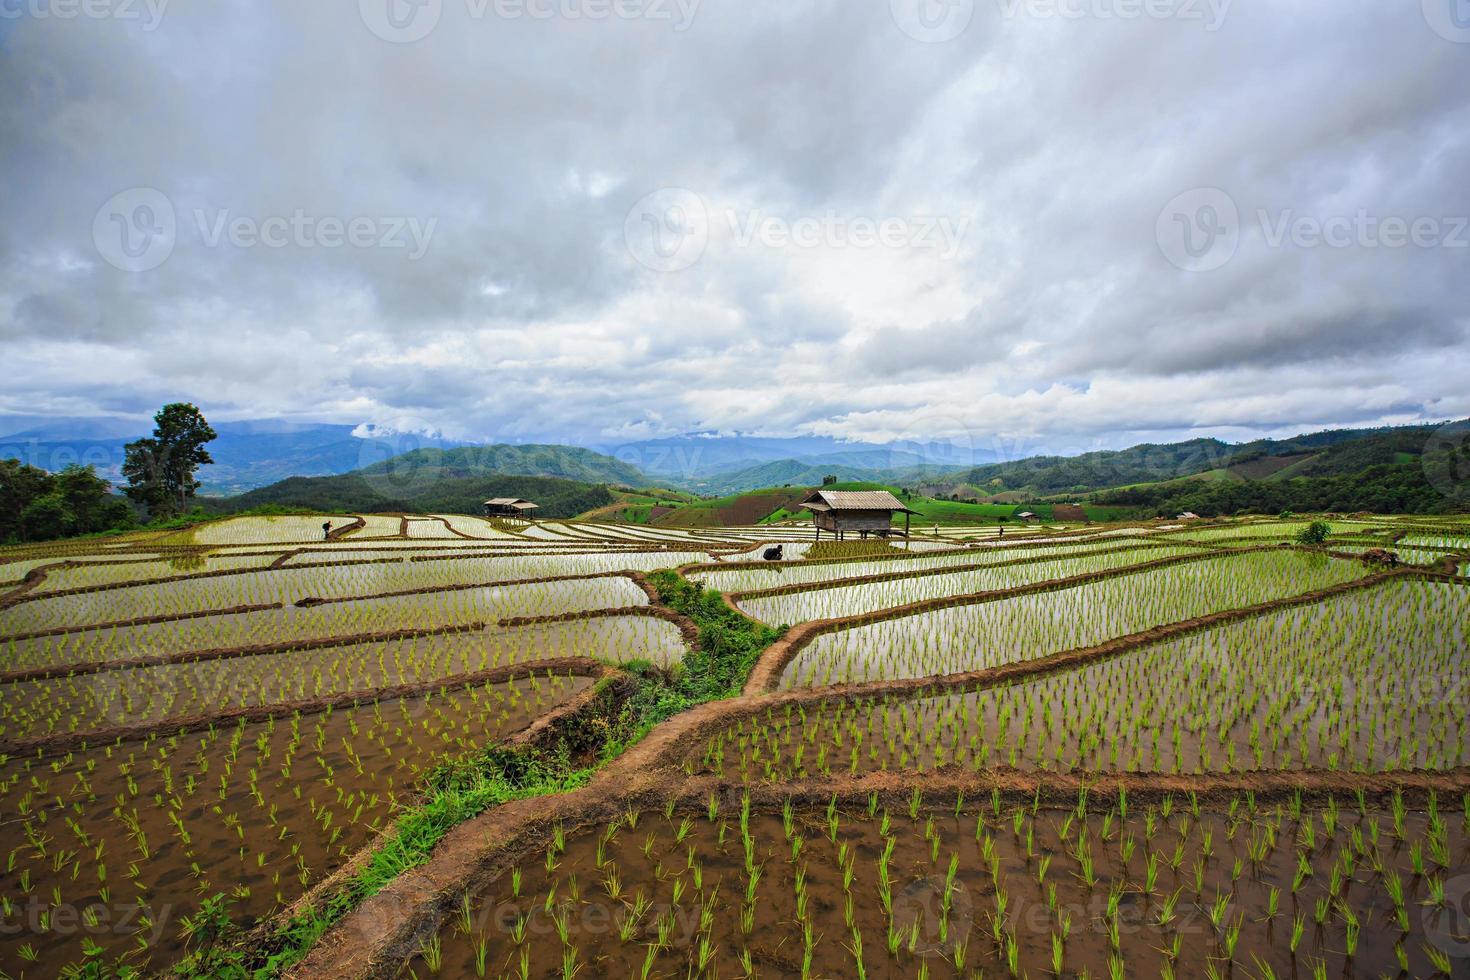 campos de arroz, papongpieng, chiang mai, tailândia. foto